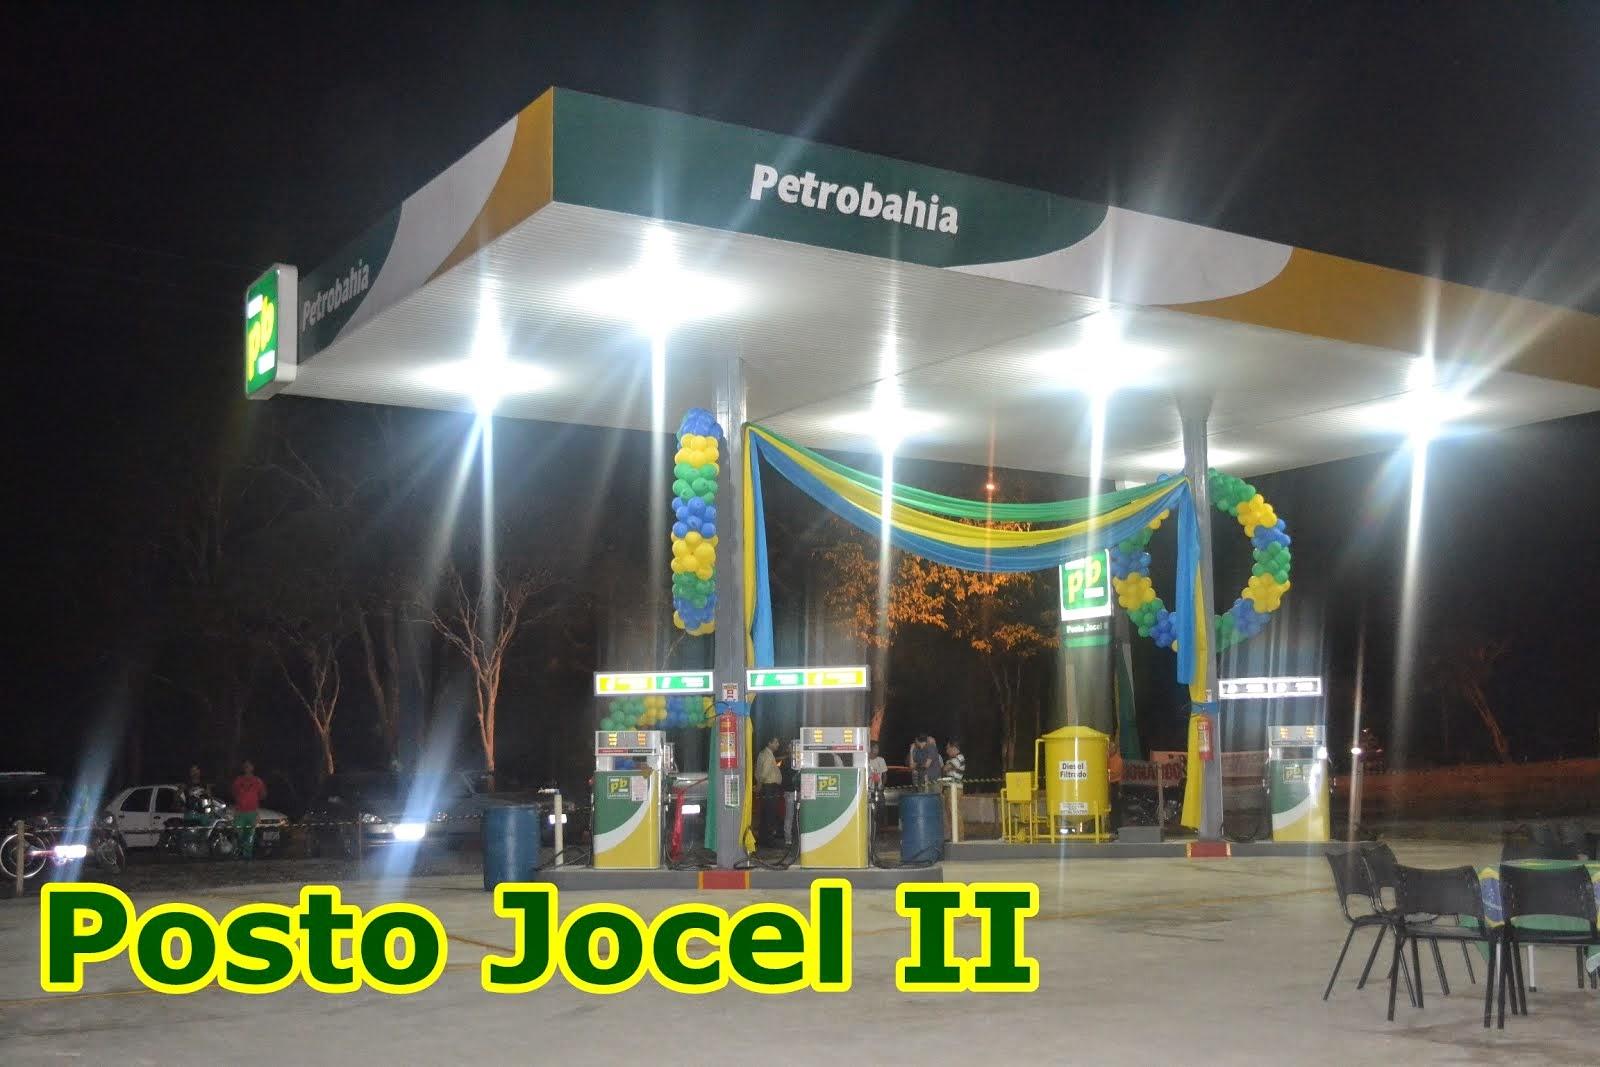 ITAJUÍPE: POSTO JOCEL II